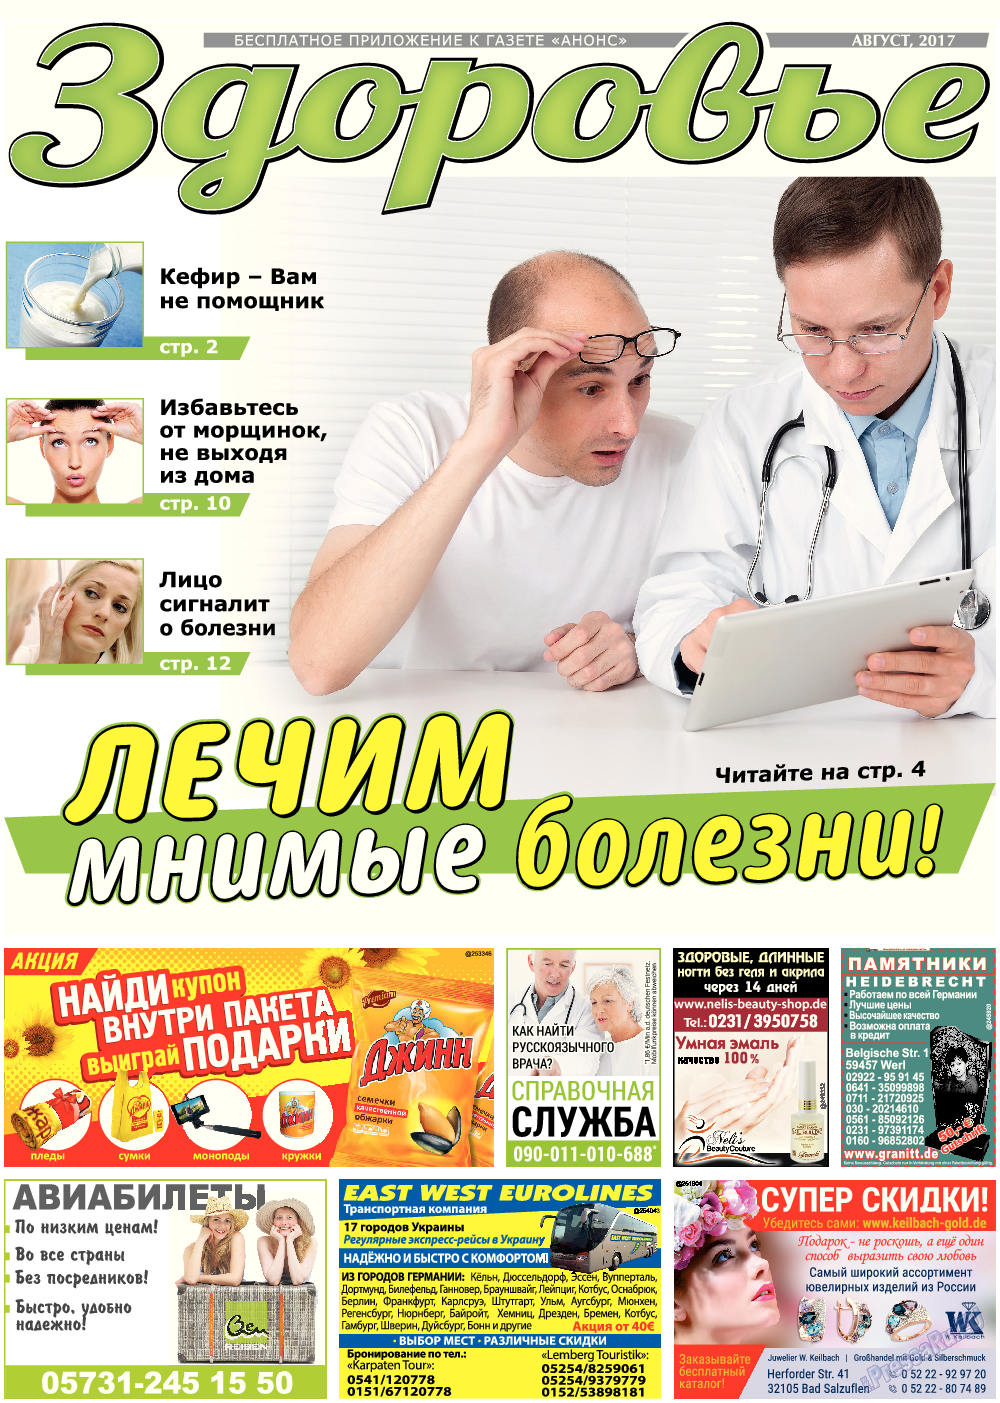 Здоровье (газета). 2017 год, номер 8, стр. 1